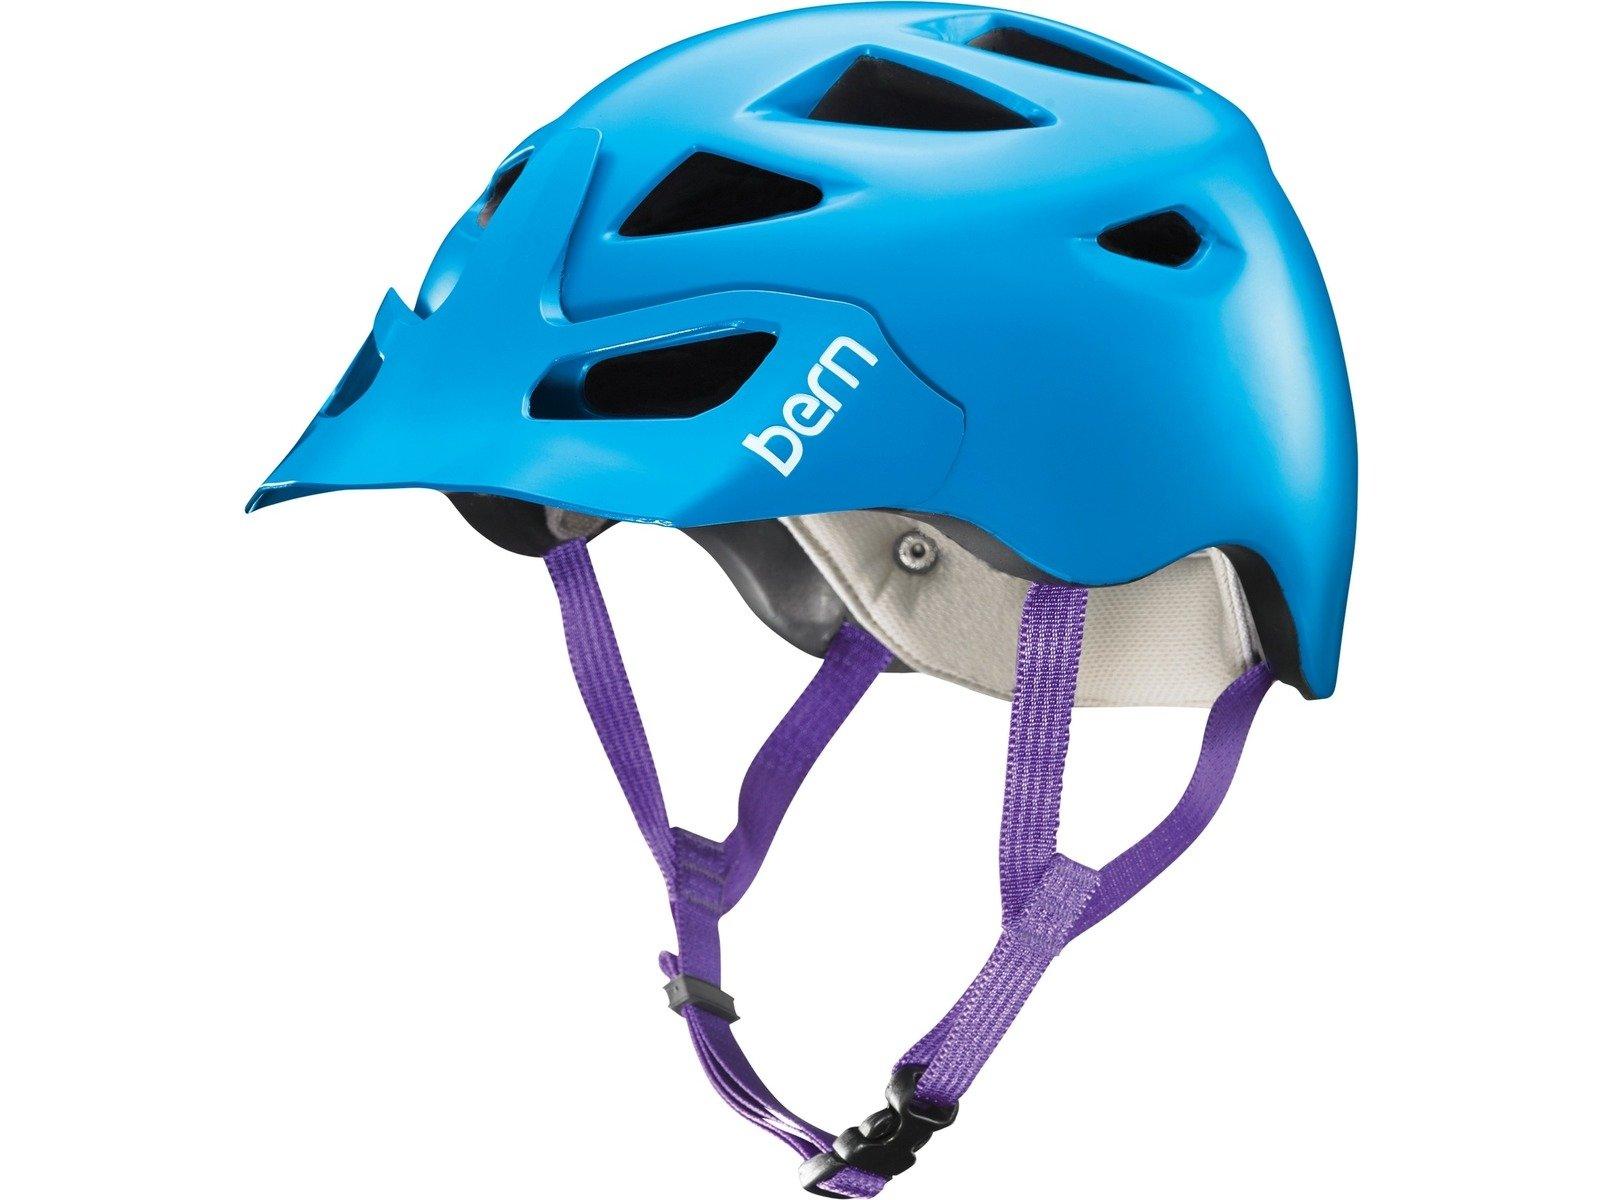 Bern Prescott Helmet with Visor (Satin Blue with Breakaway Visor, XS/S)